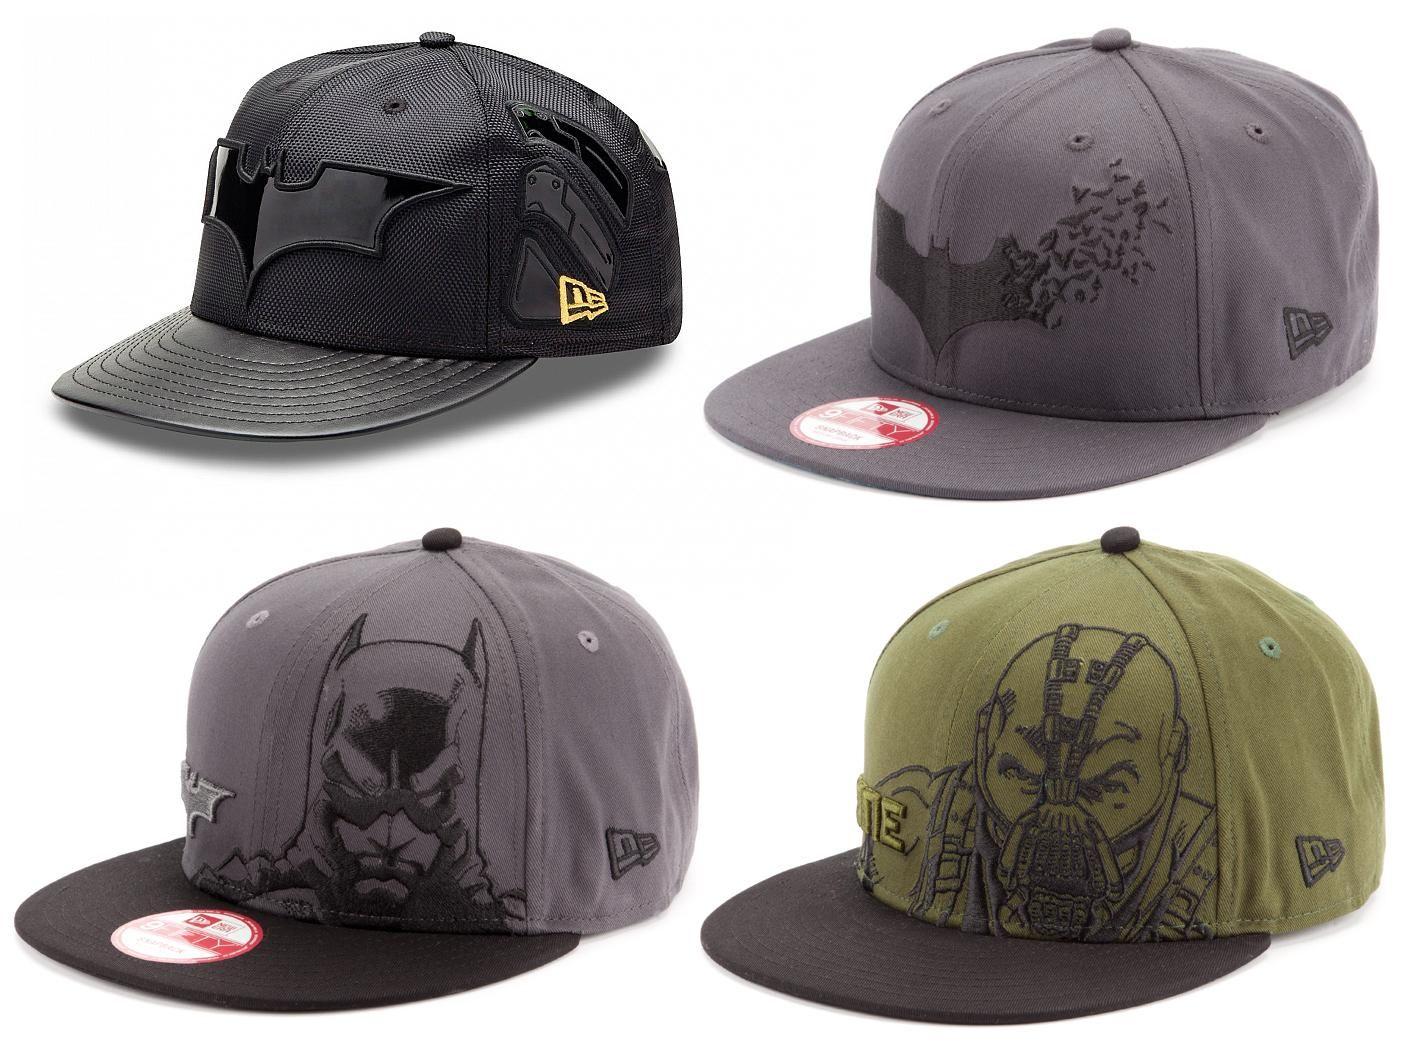 The Dark Knight Rises New Era Hat Collection 1  c04857eb7bb